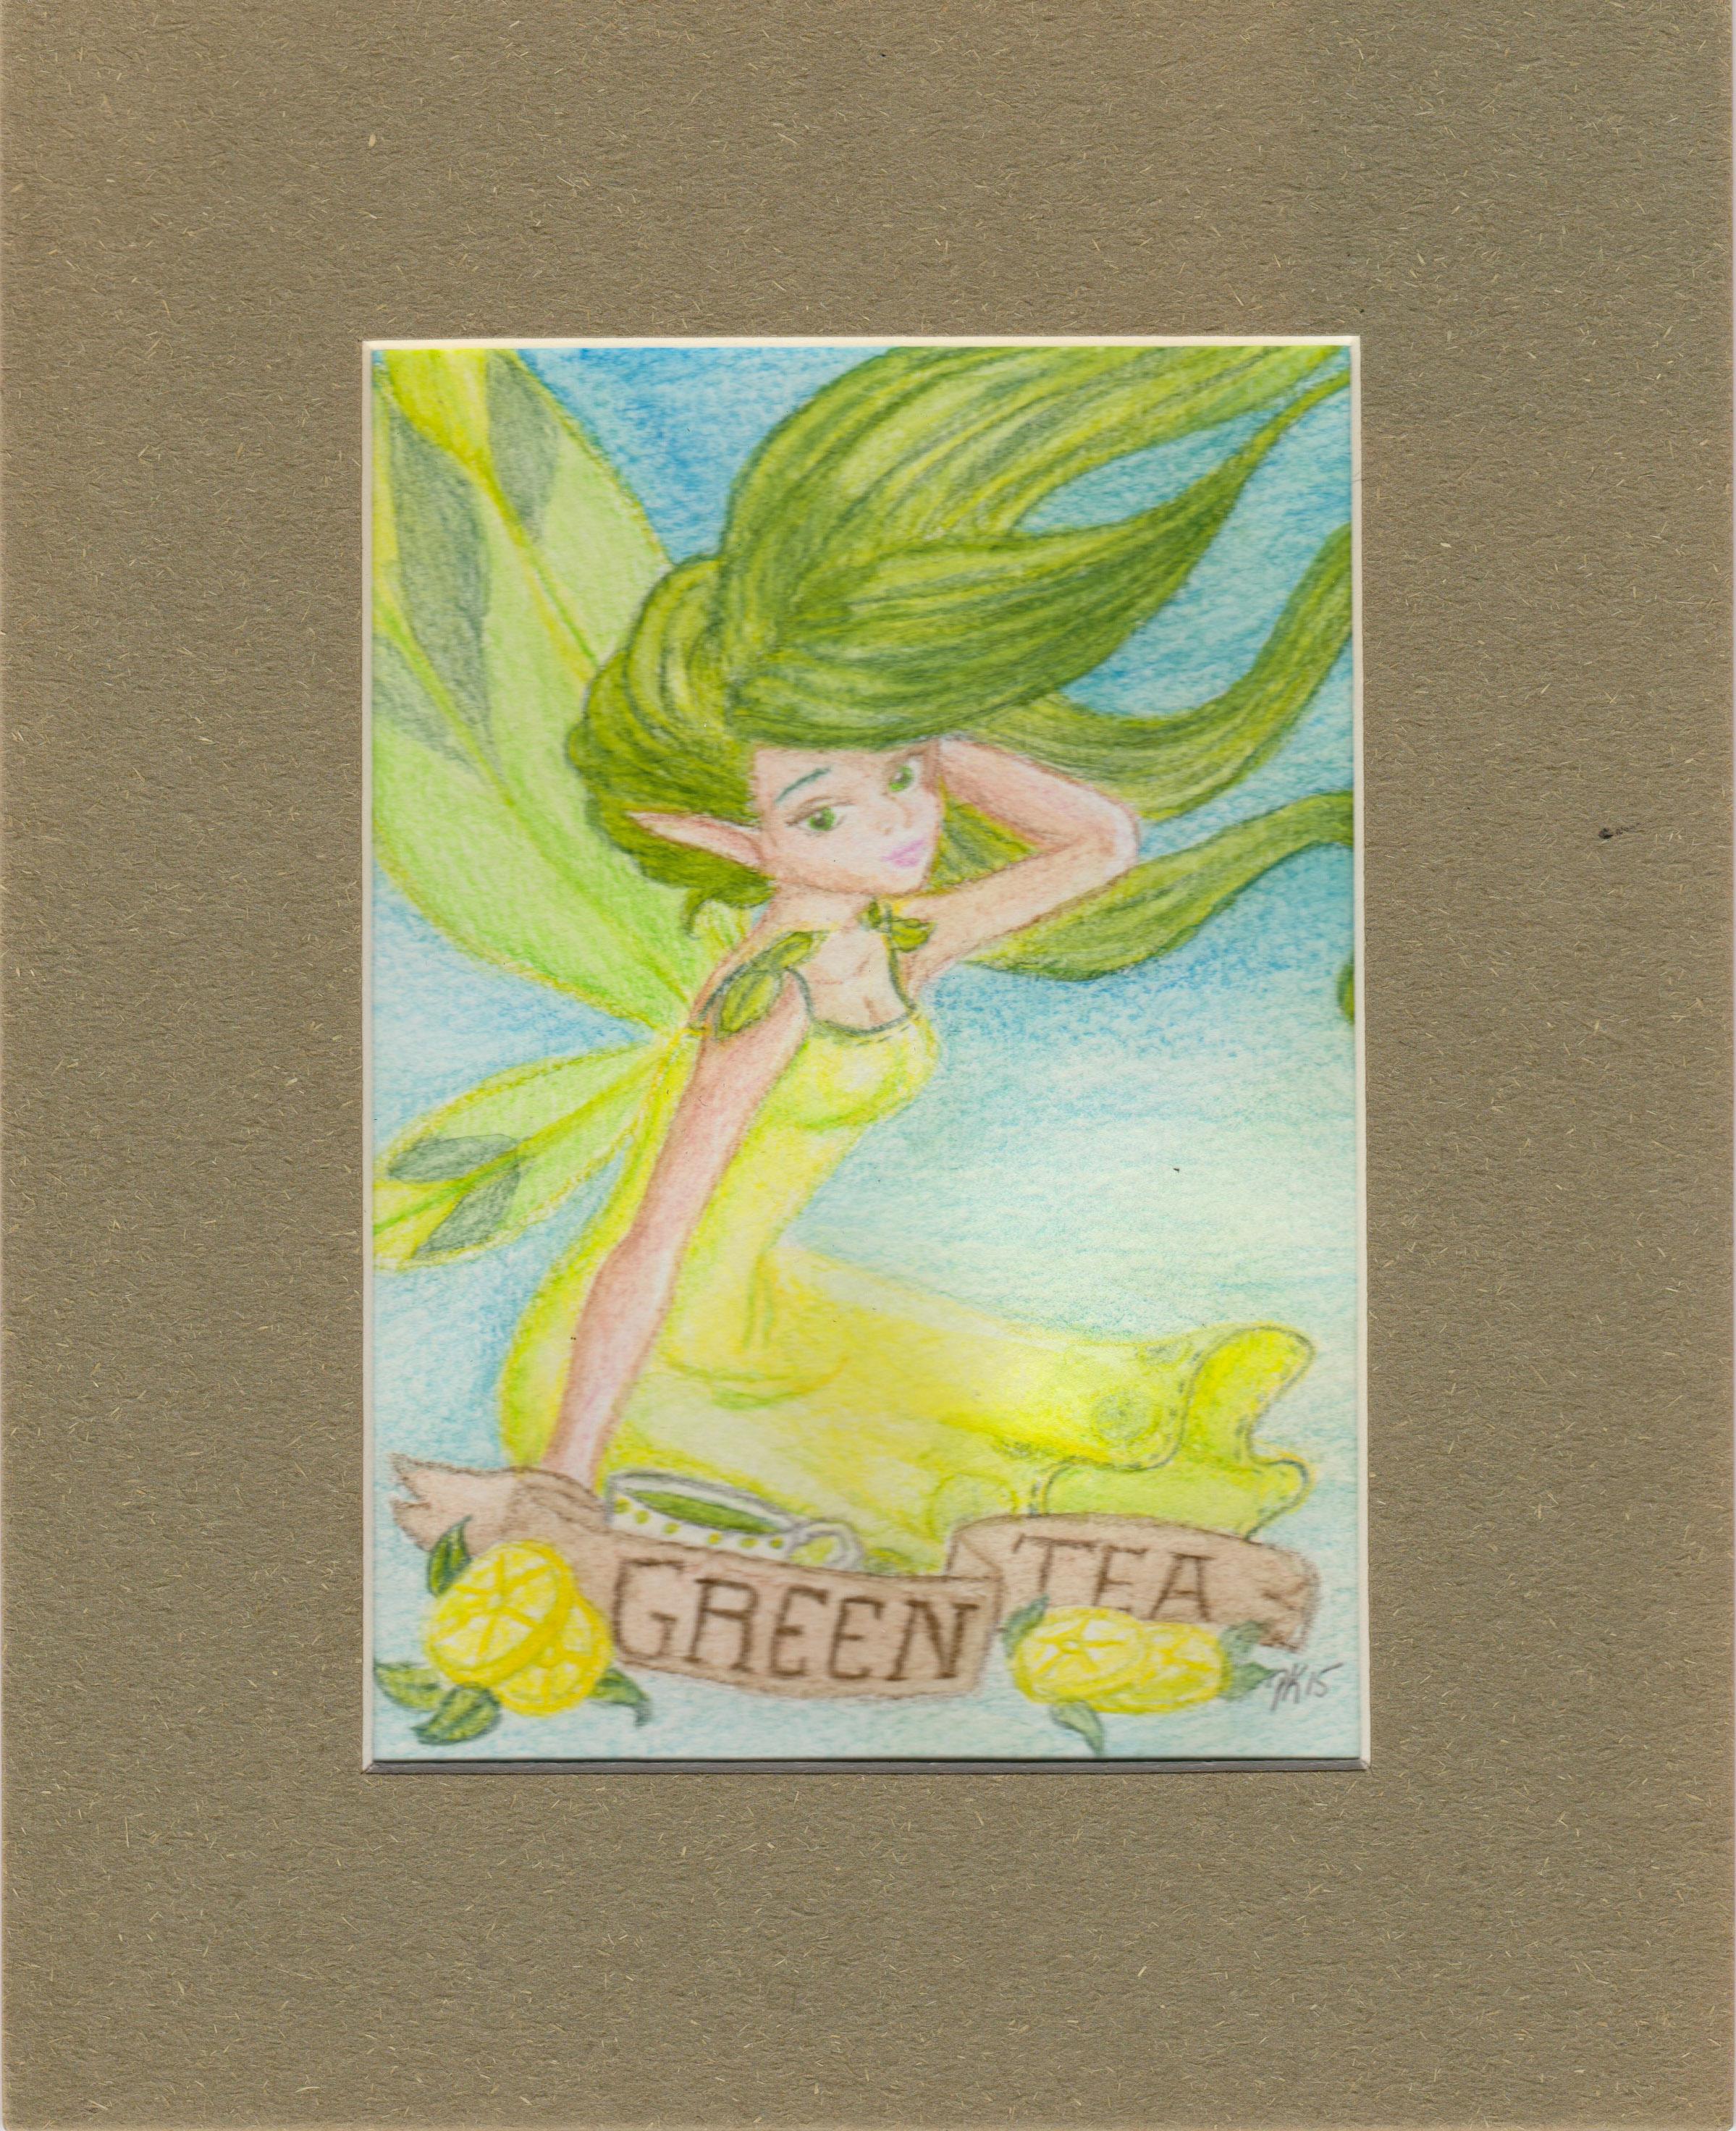 Green Tea fairy